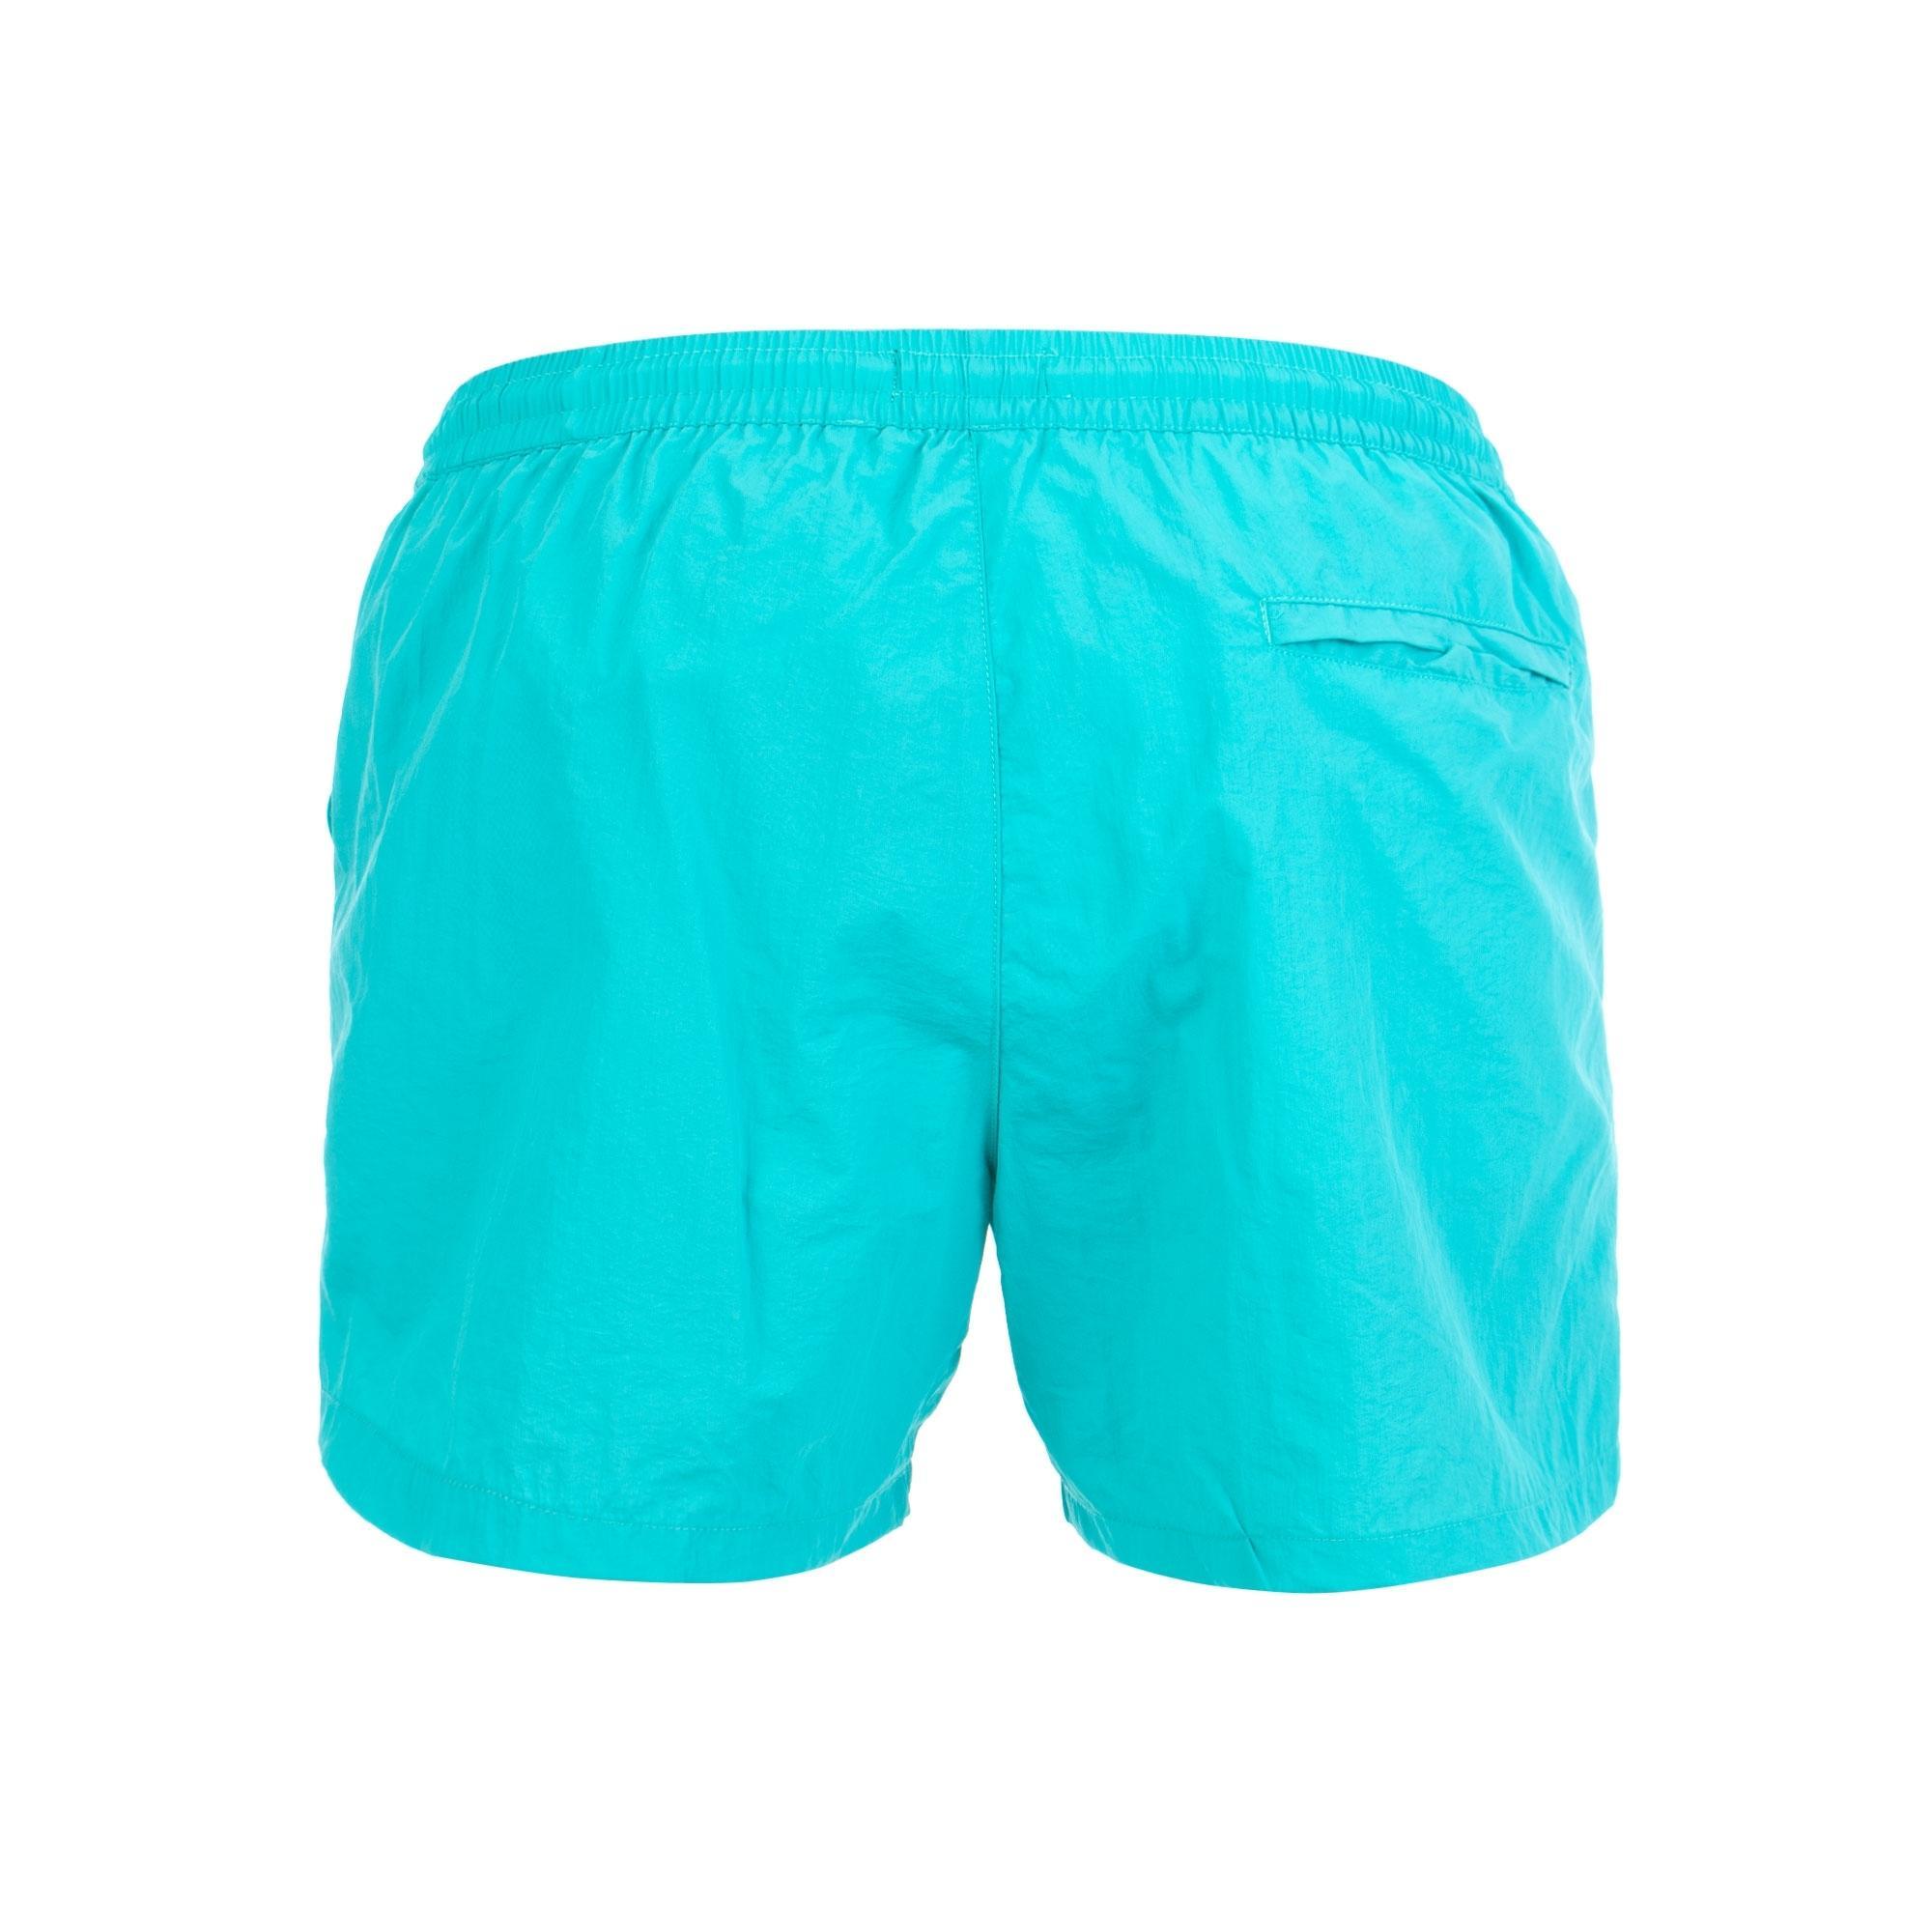 d022ffbb9e Lyle & Scott Micro Swim Short in Blue for Men - Lyst